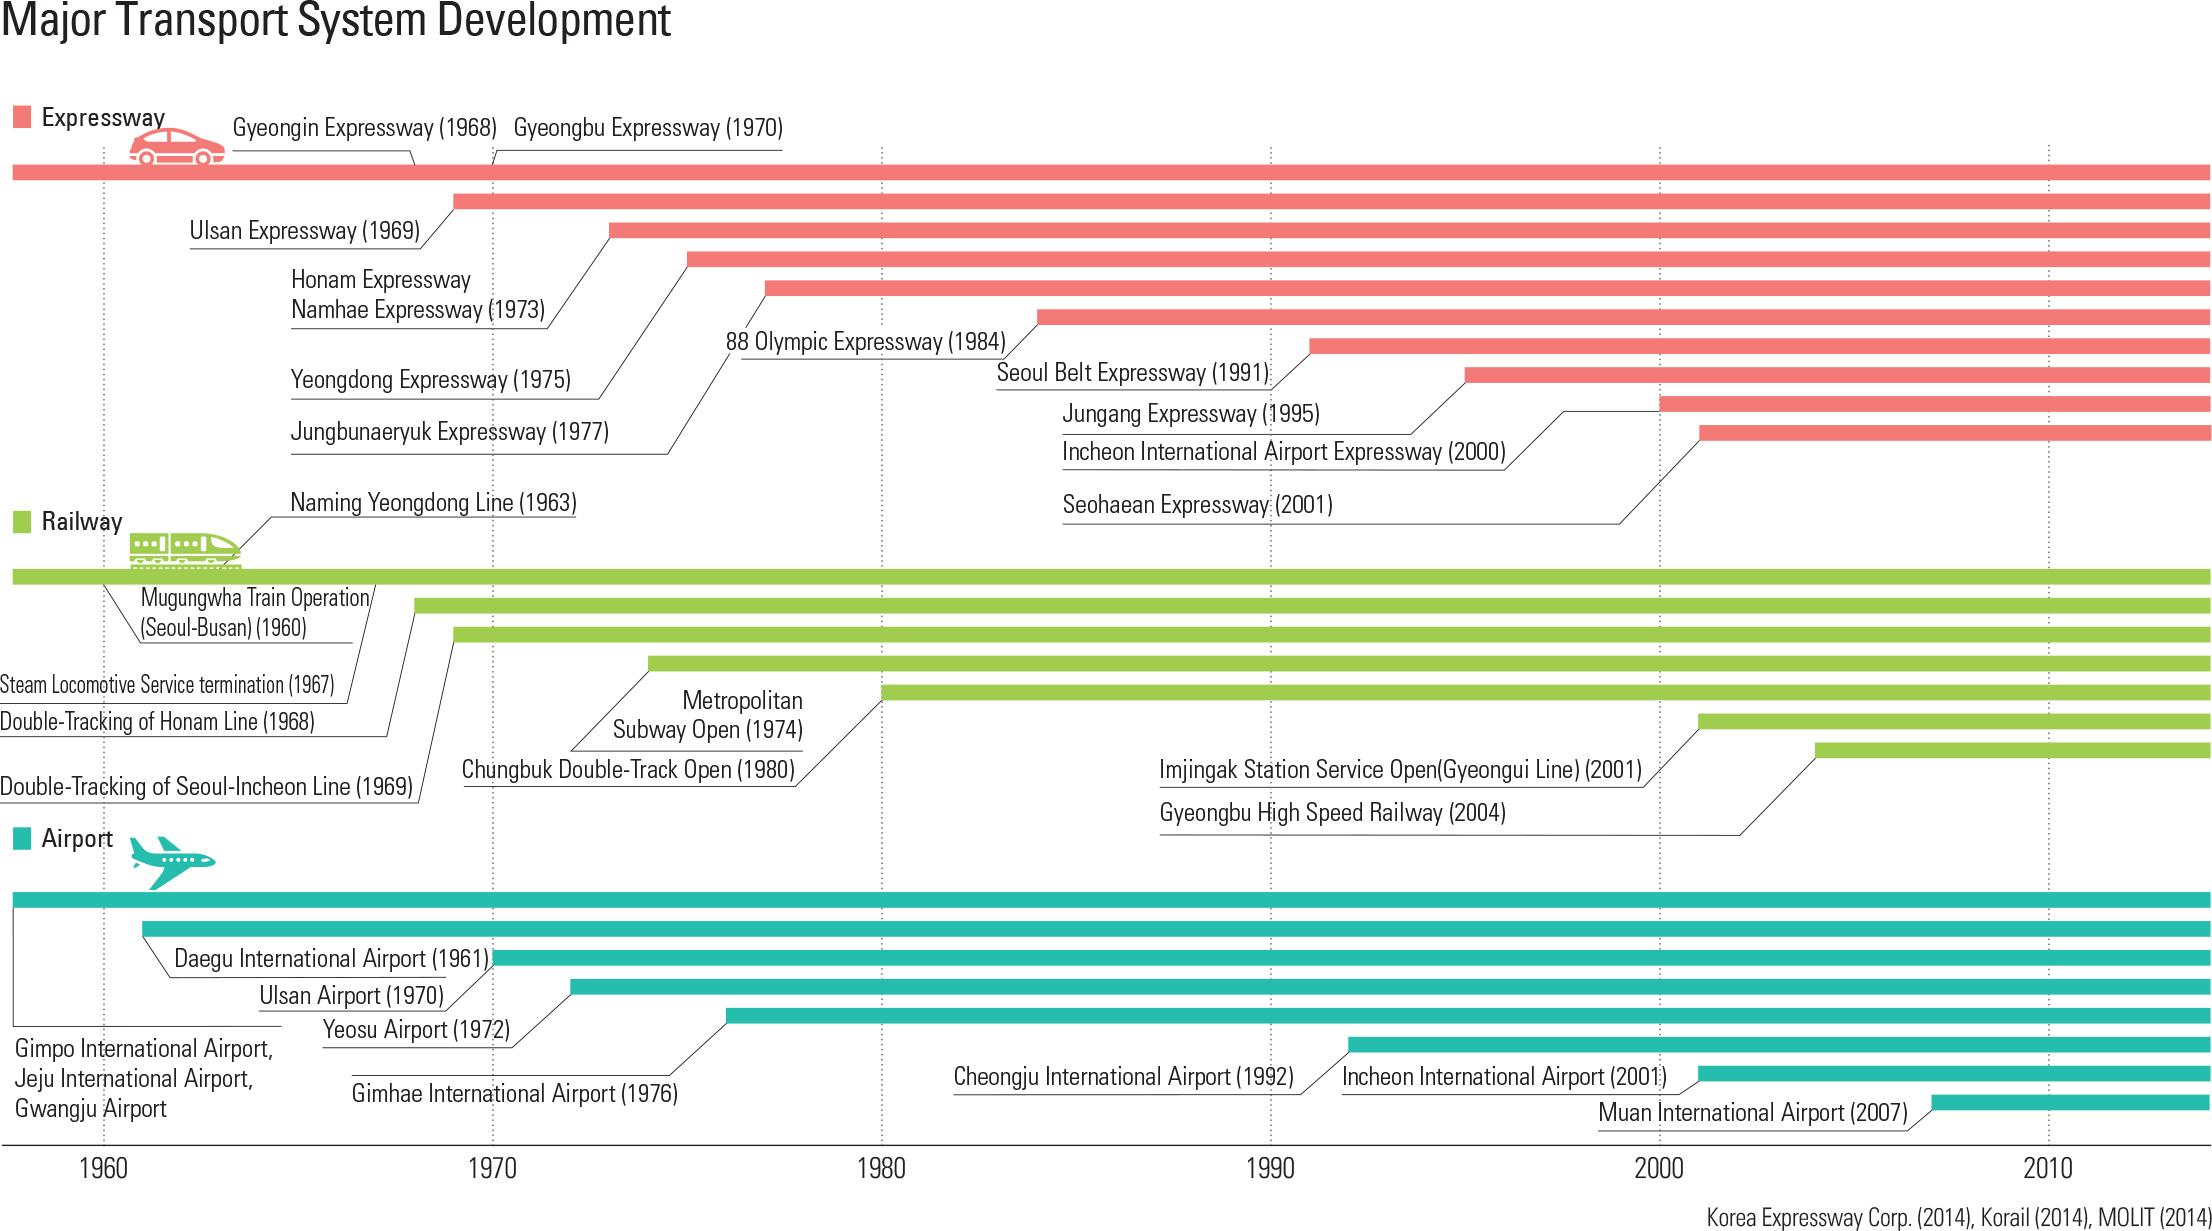 Major Transport System Development